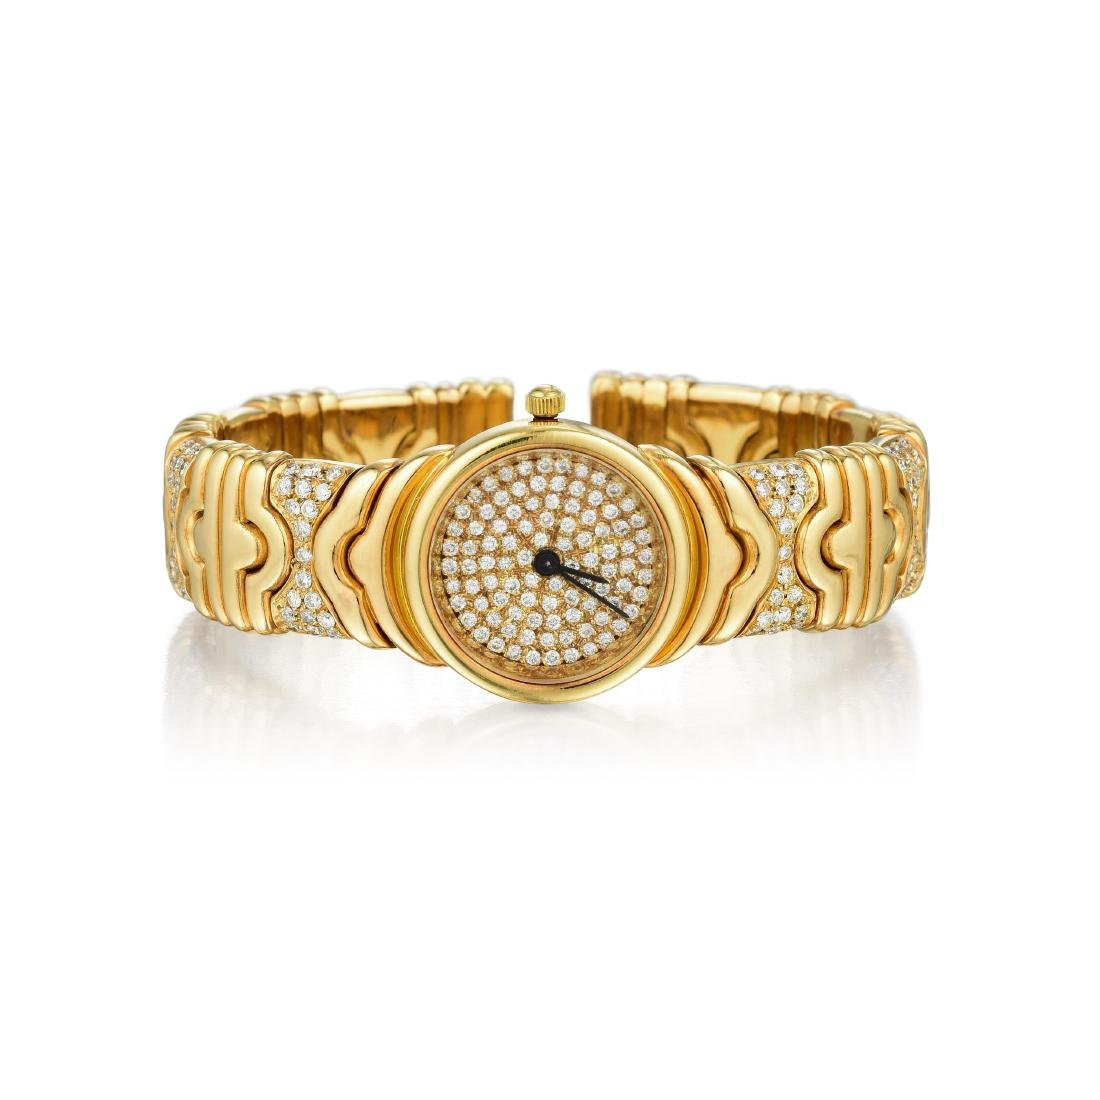 An 18K Gold Diamond Bangle Watch